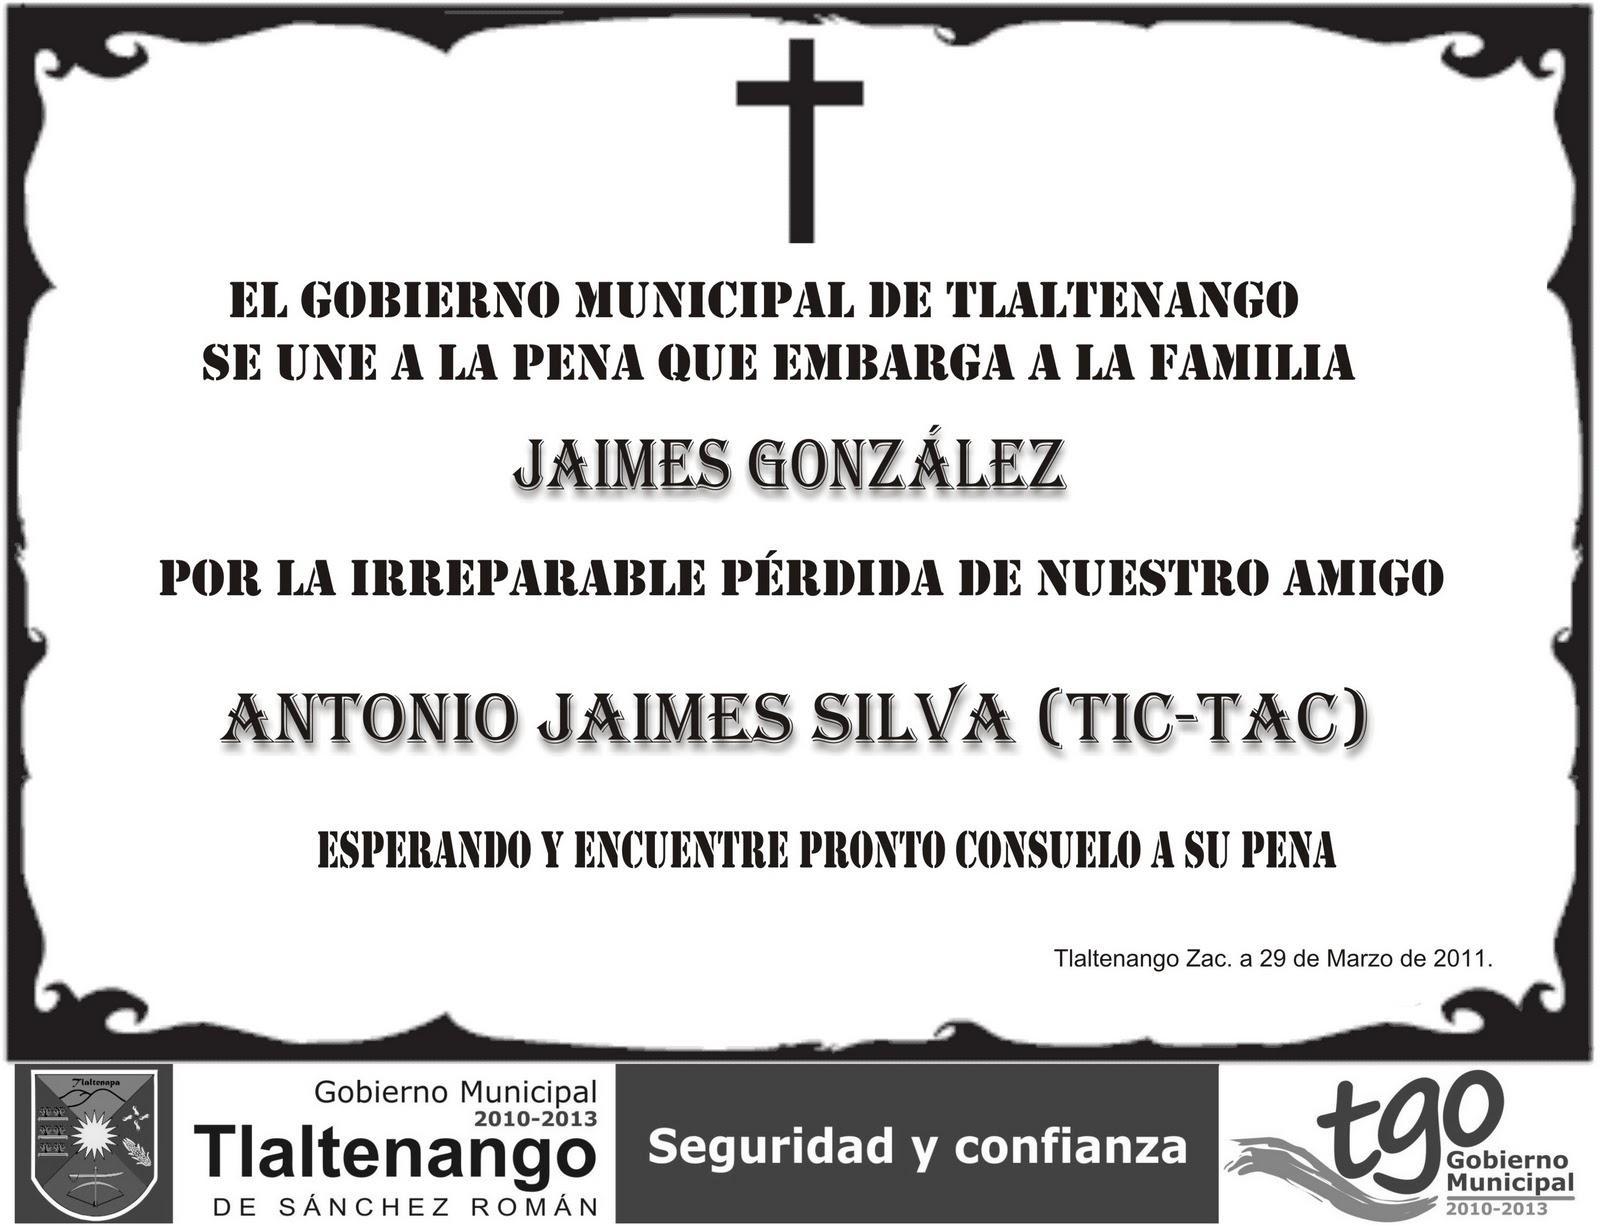 Gobierno Municipal de Tlaltenango sept2010- dic2011: marzo 2011